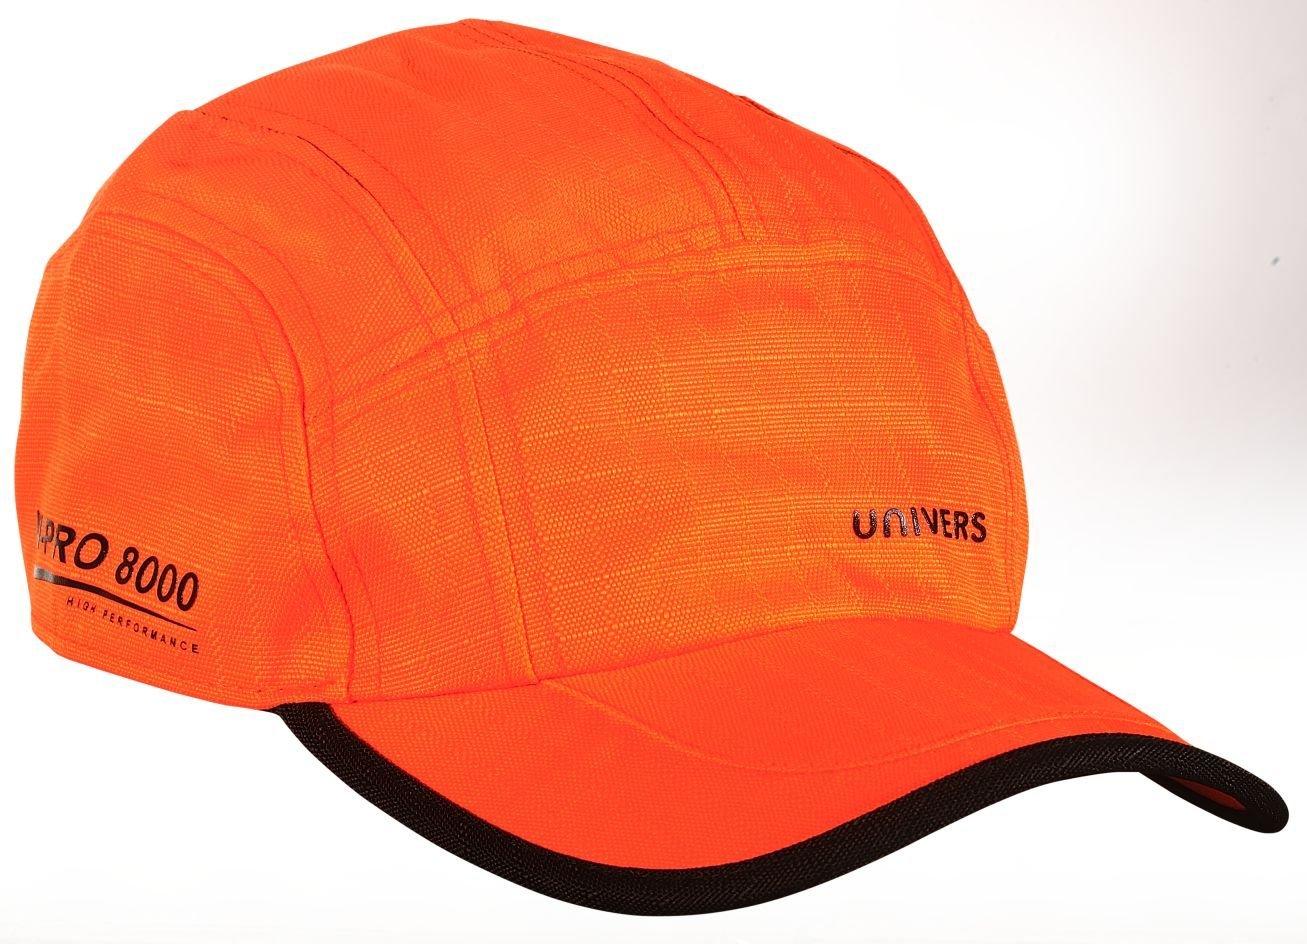 UNIVERS-TEX NEW WILD BOAR JOCKEY CAP 9502 / 55